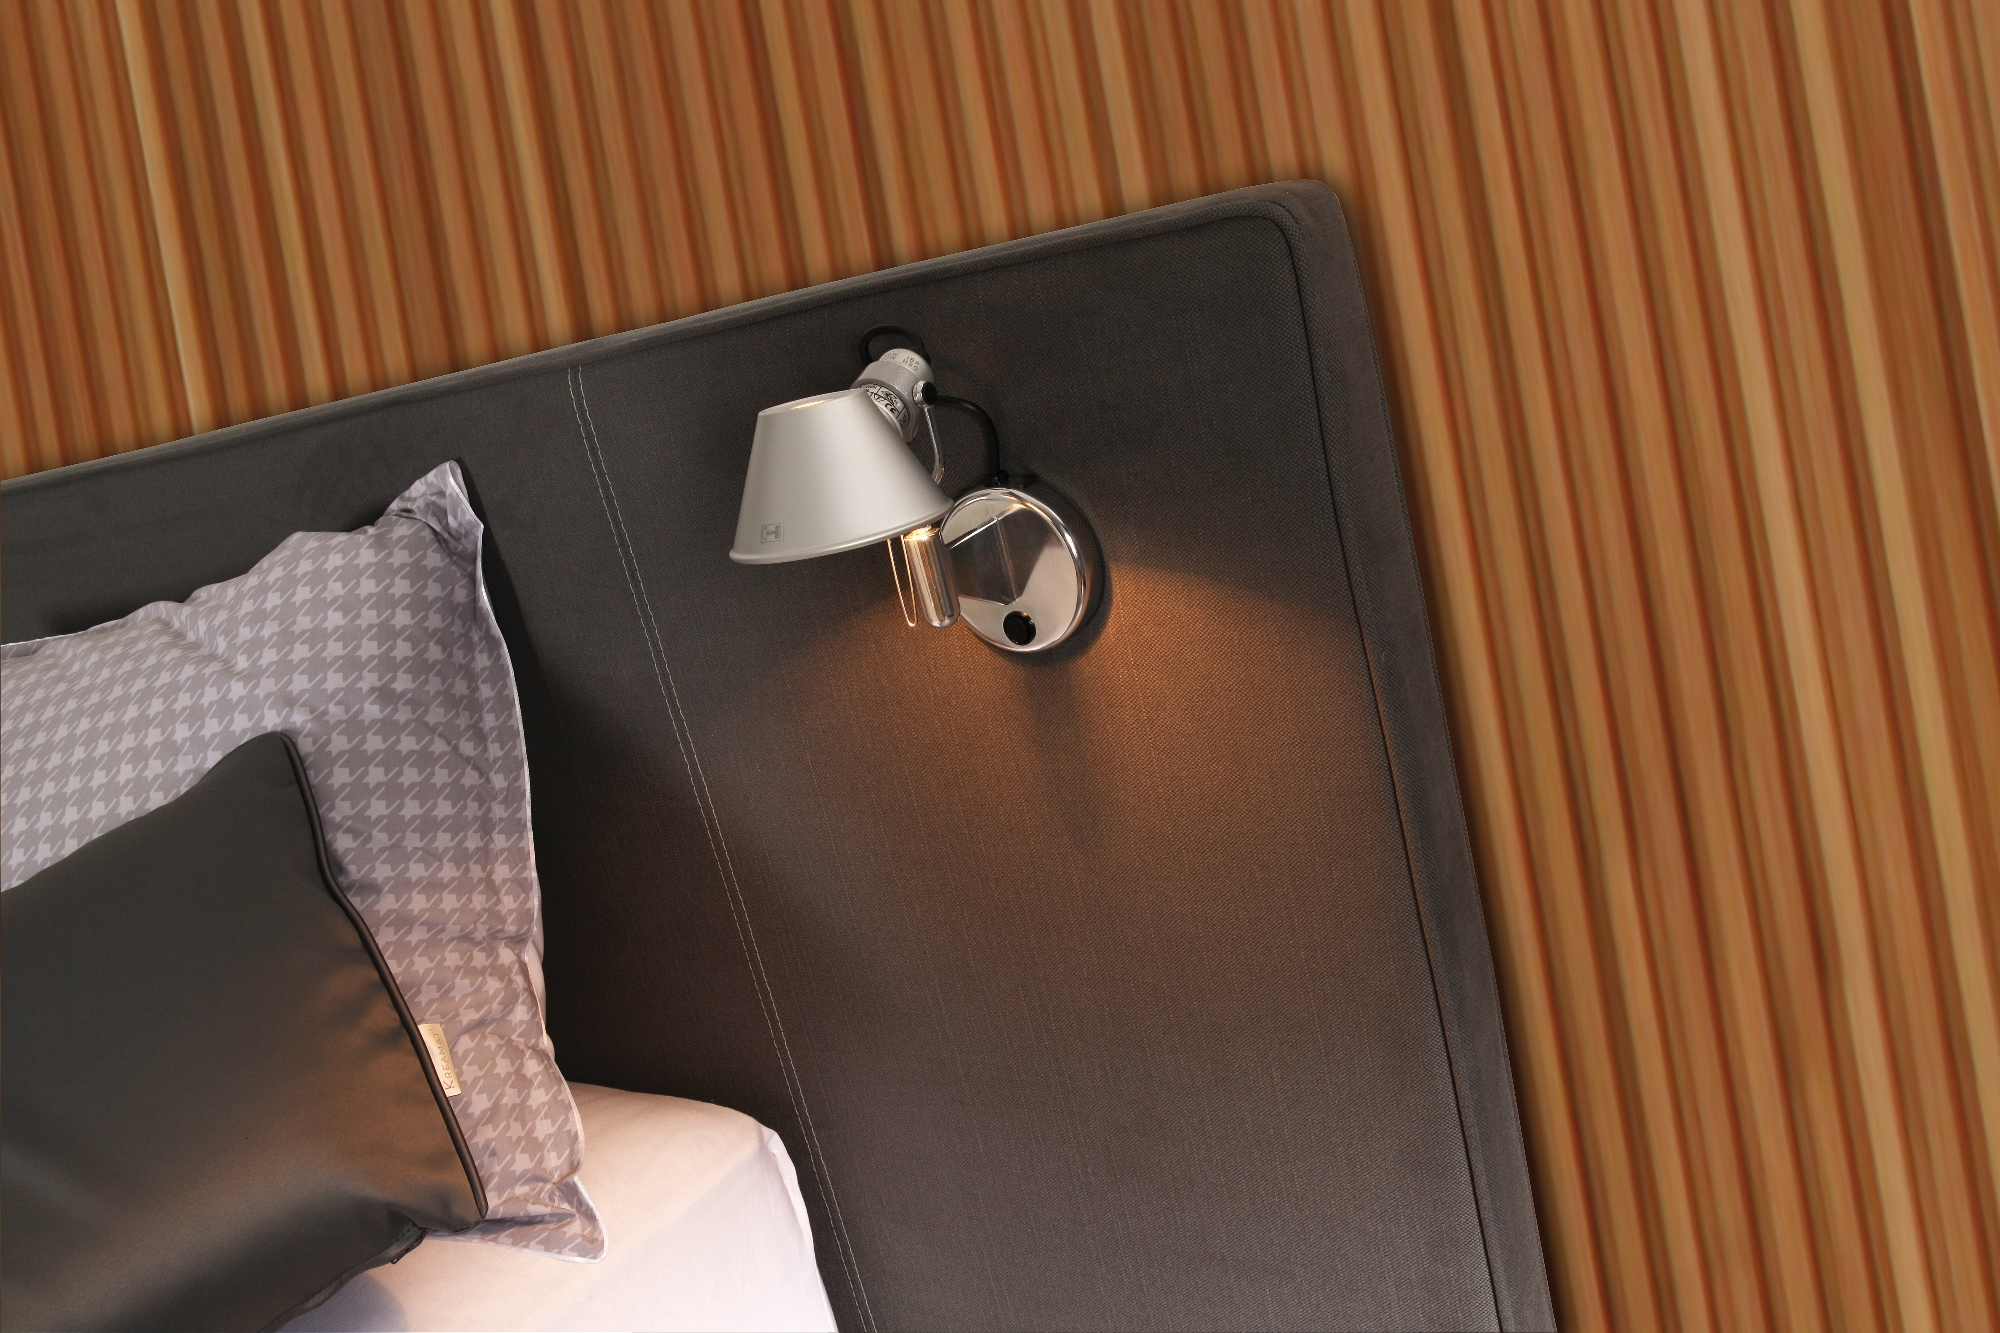 kreamat boxspringbett hotello betten kraft. Black Bedroom Furniture Sets. Home Design Ideas